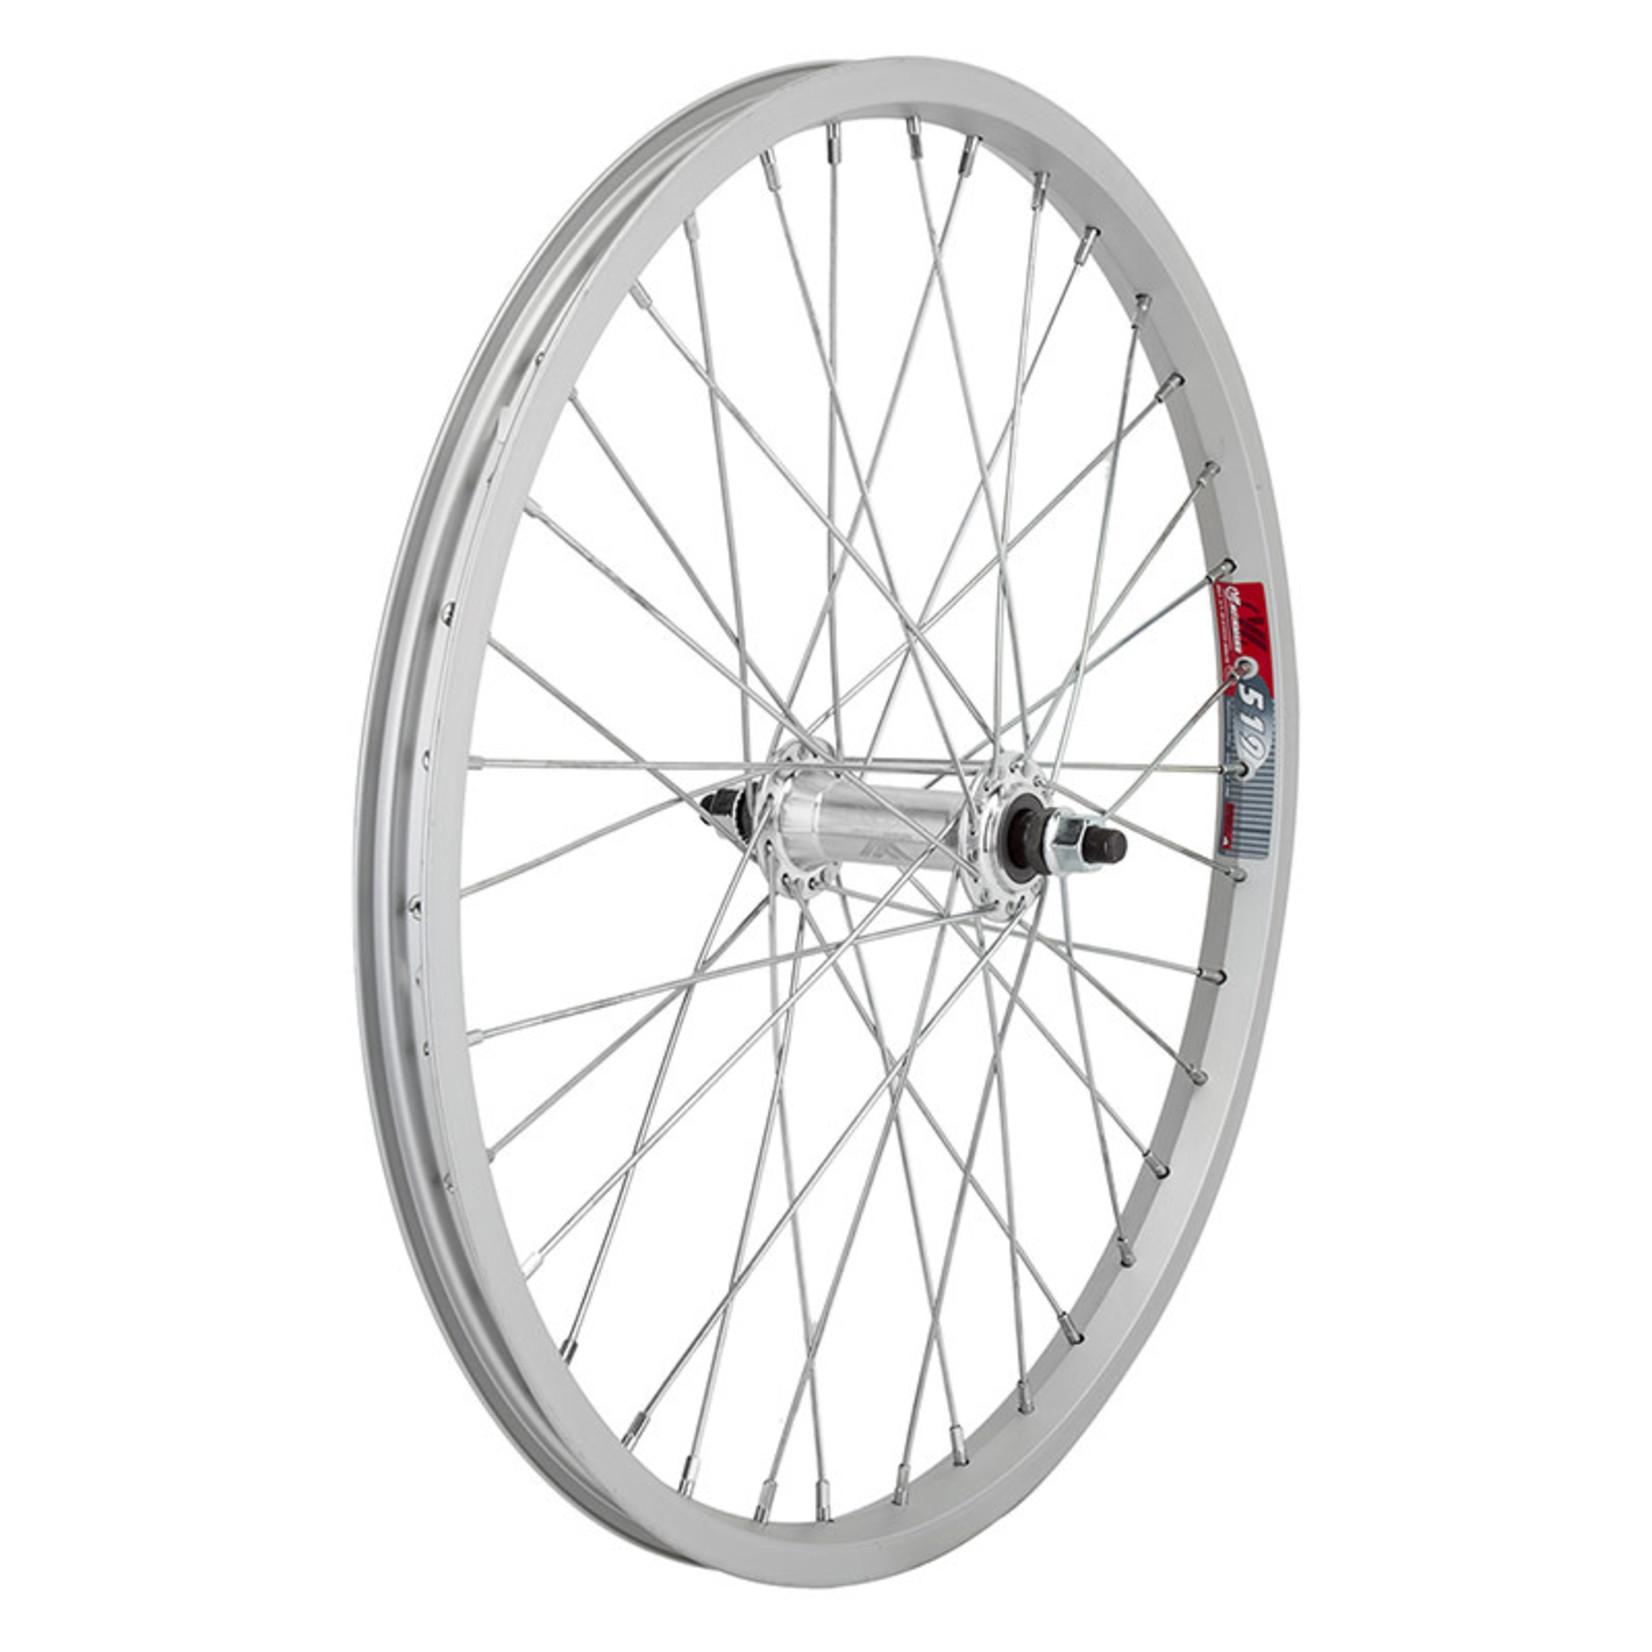 20x1.75 Front Wheel Alloy BO 3/8 14g Silver Single Wall